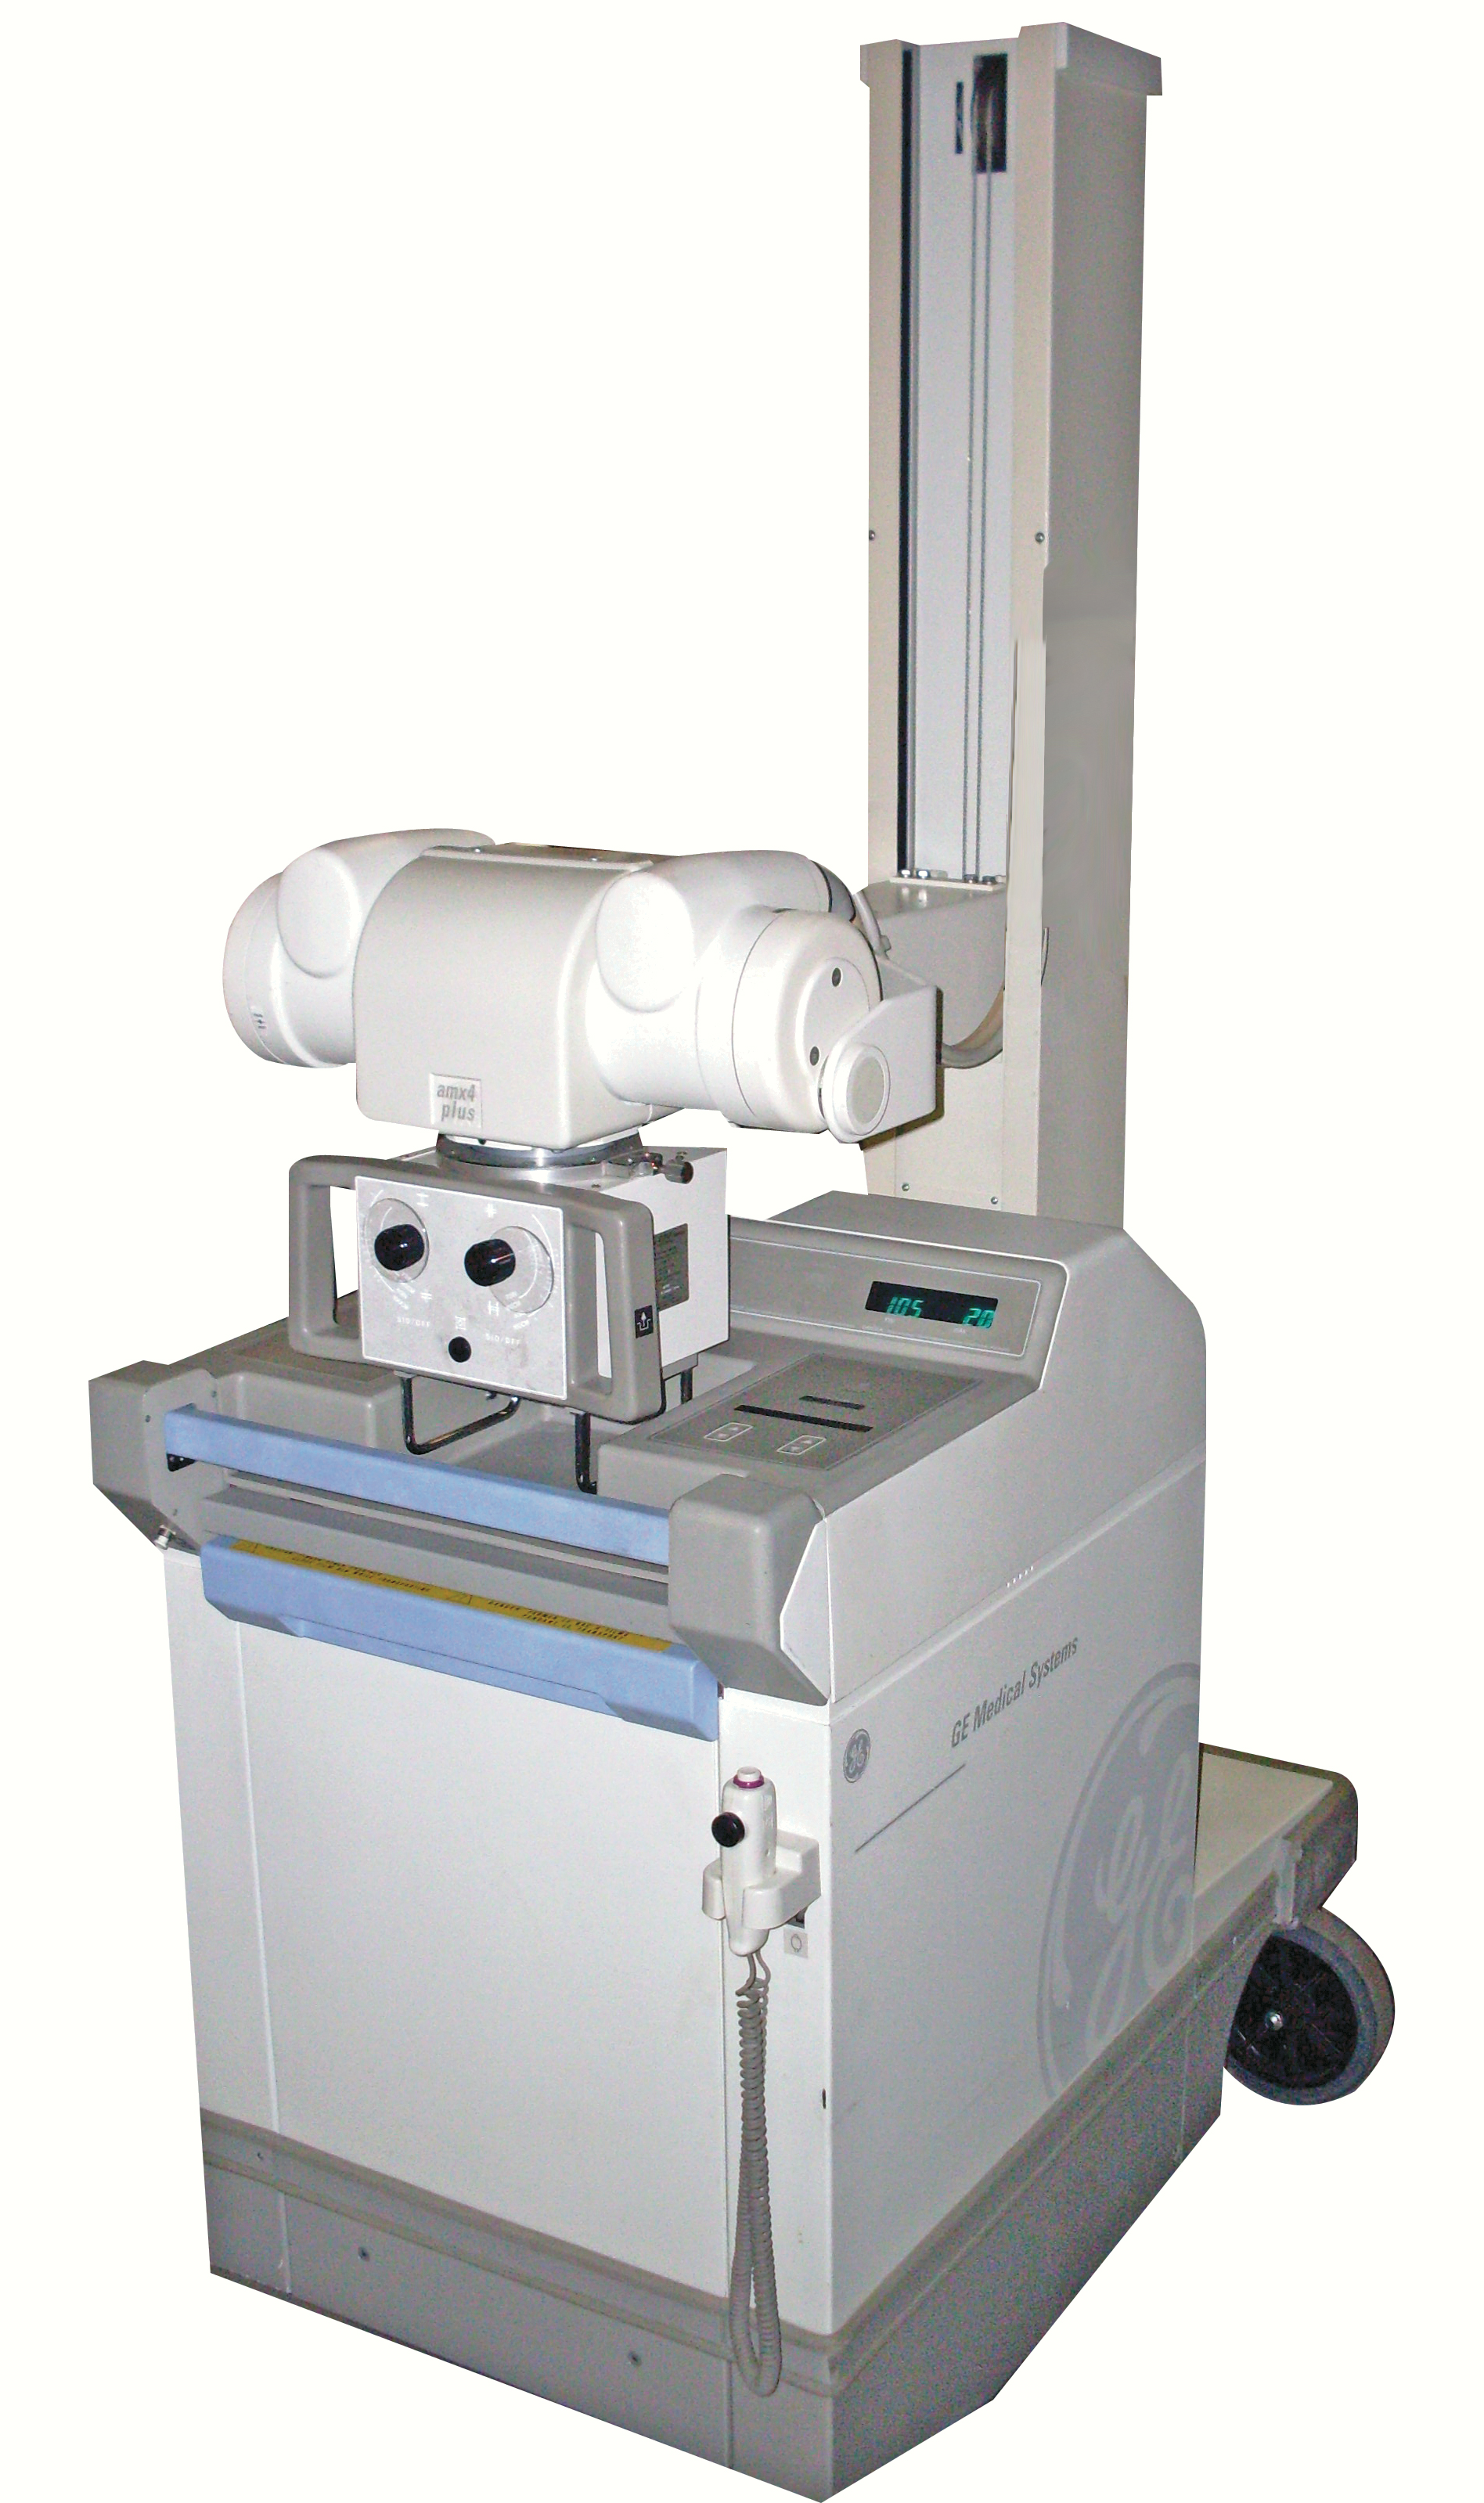 GE AMX IV Portable X-ray